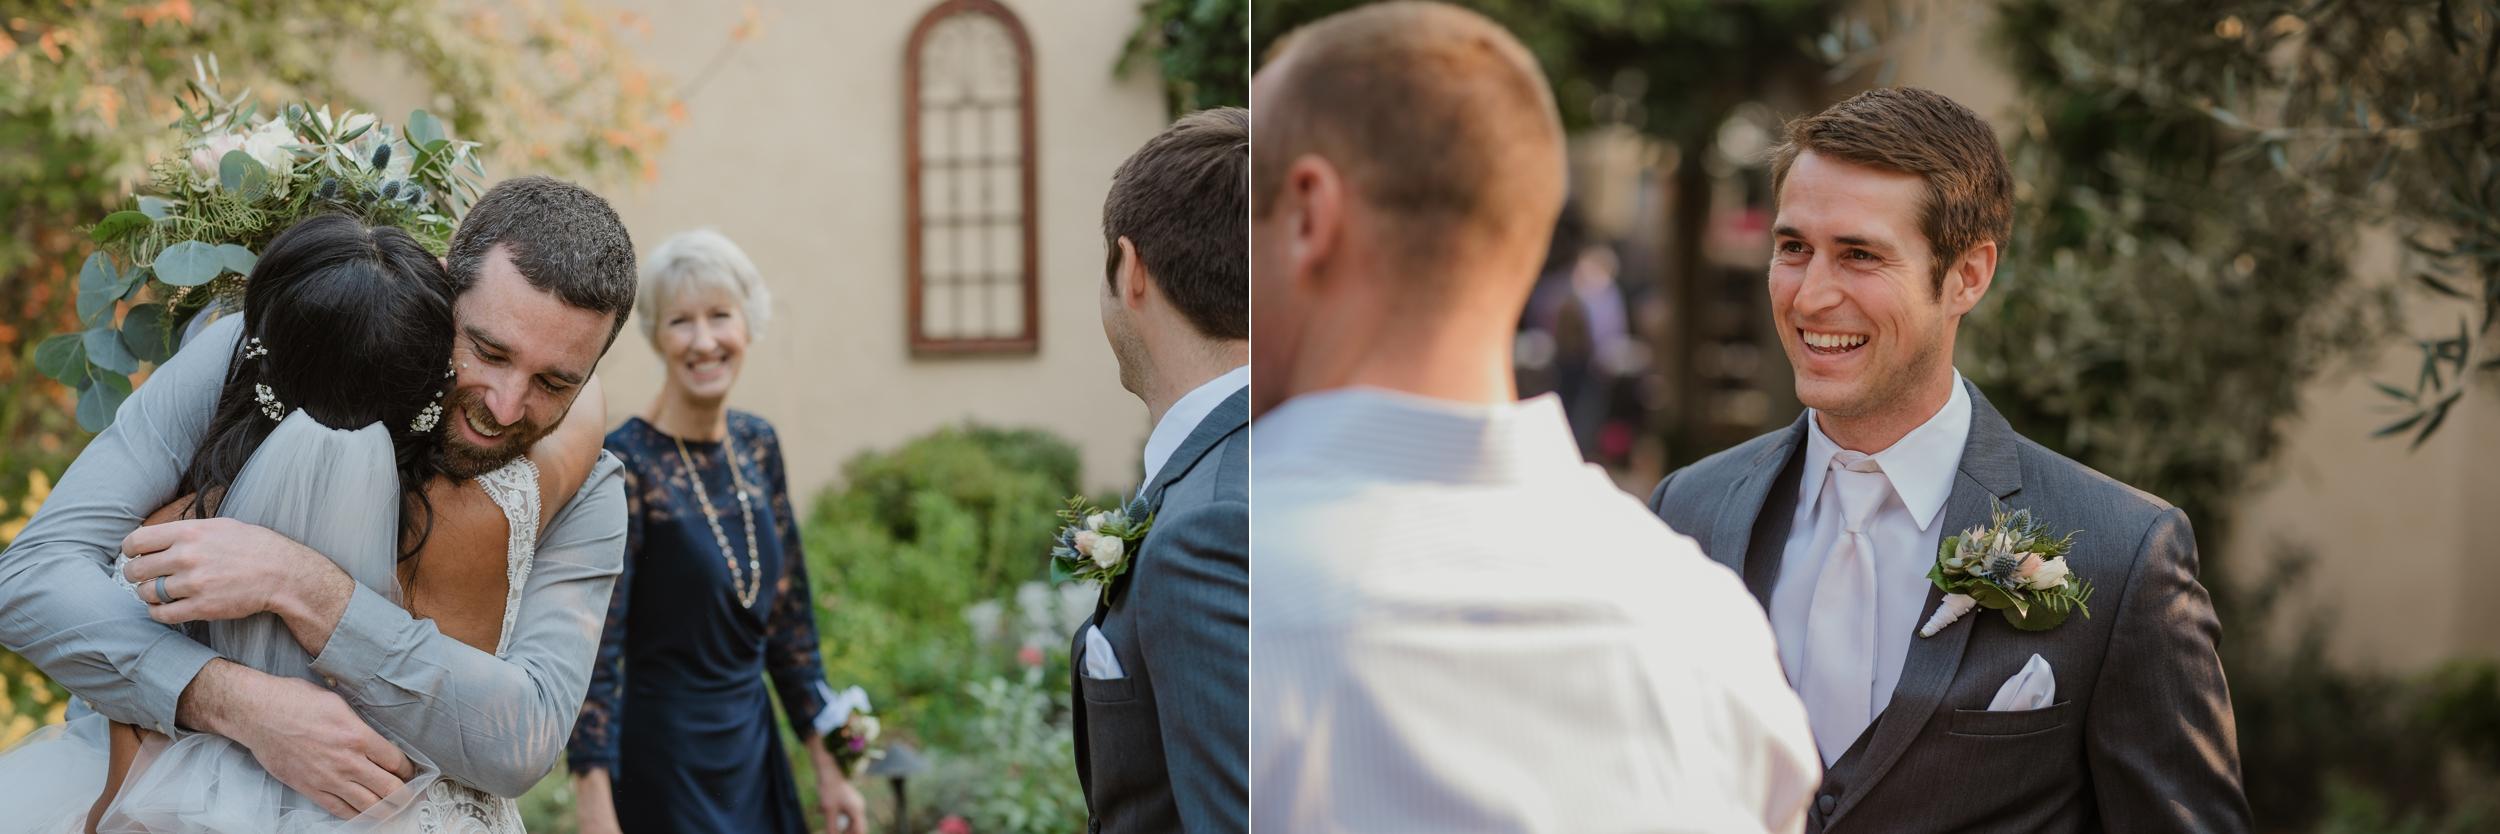 031marin-petaluma-backyard-wedding-vivianchen-187_WEB.jpg